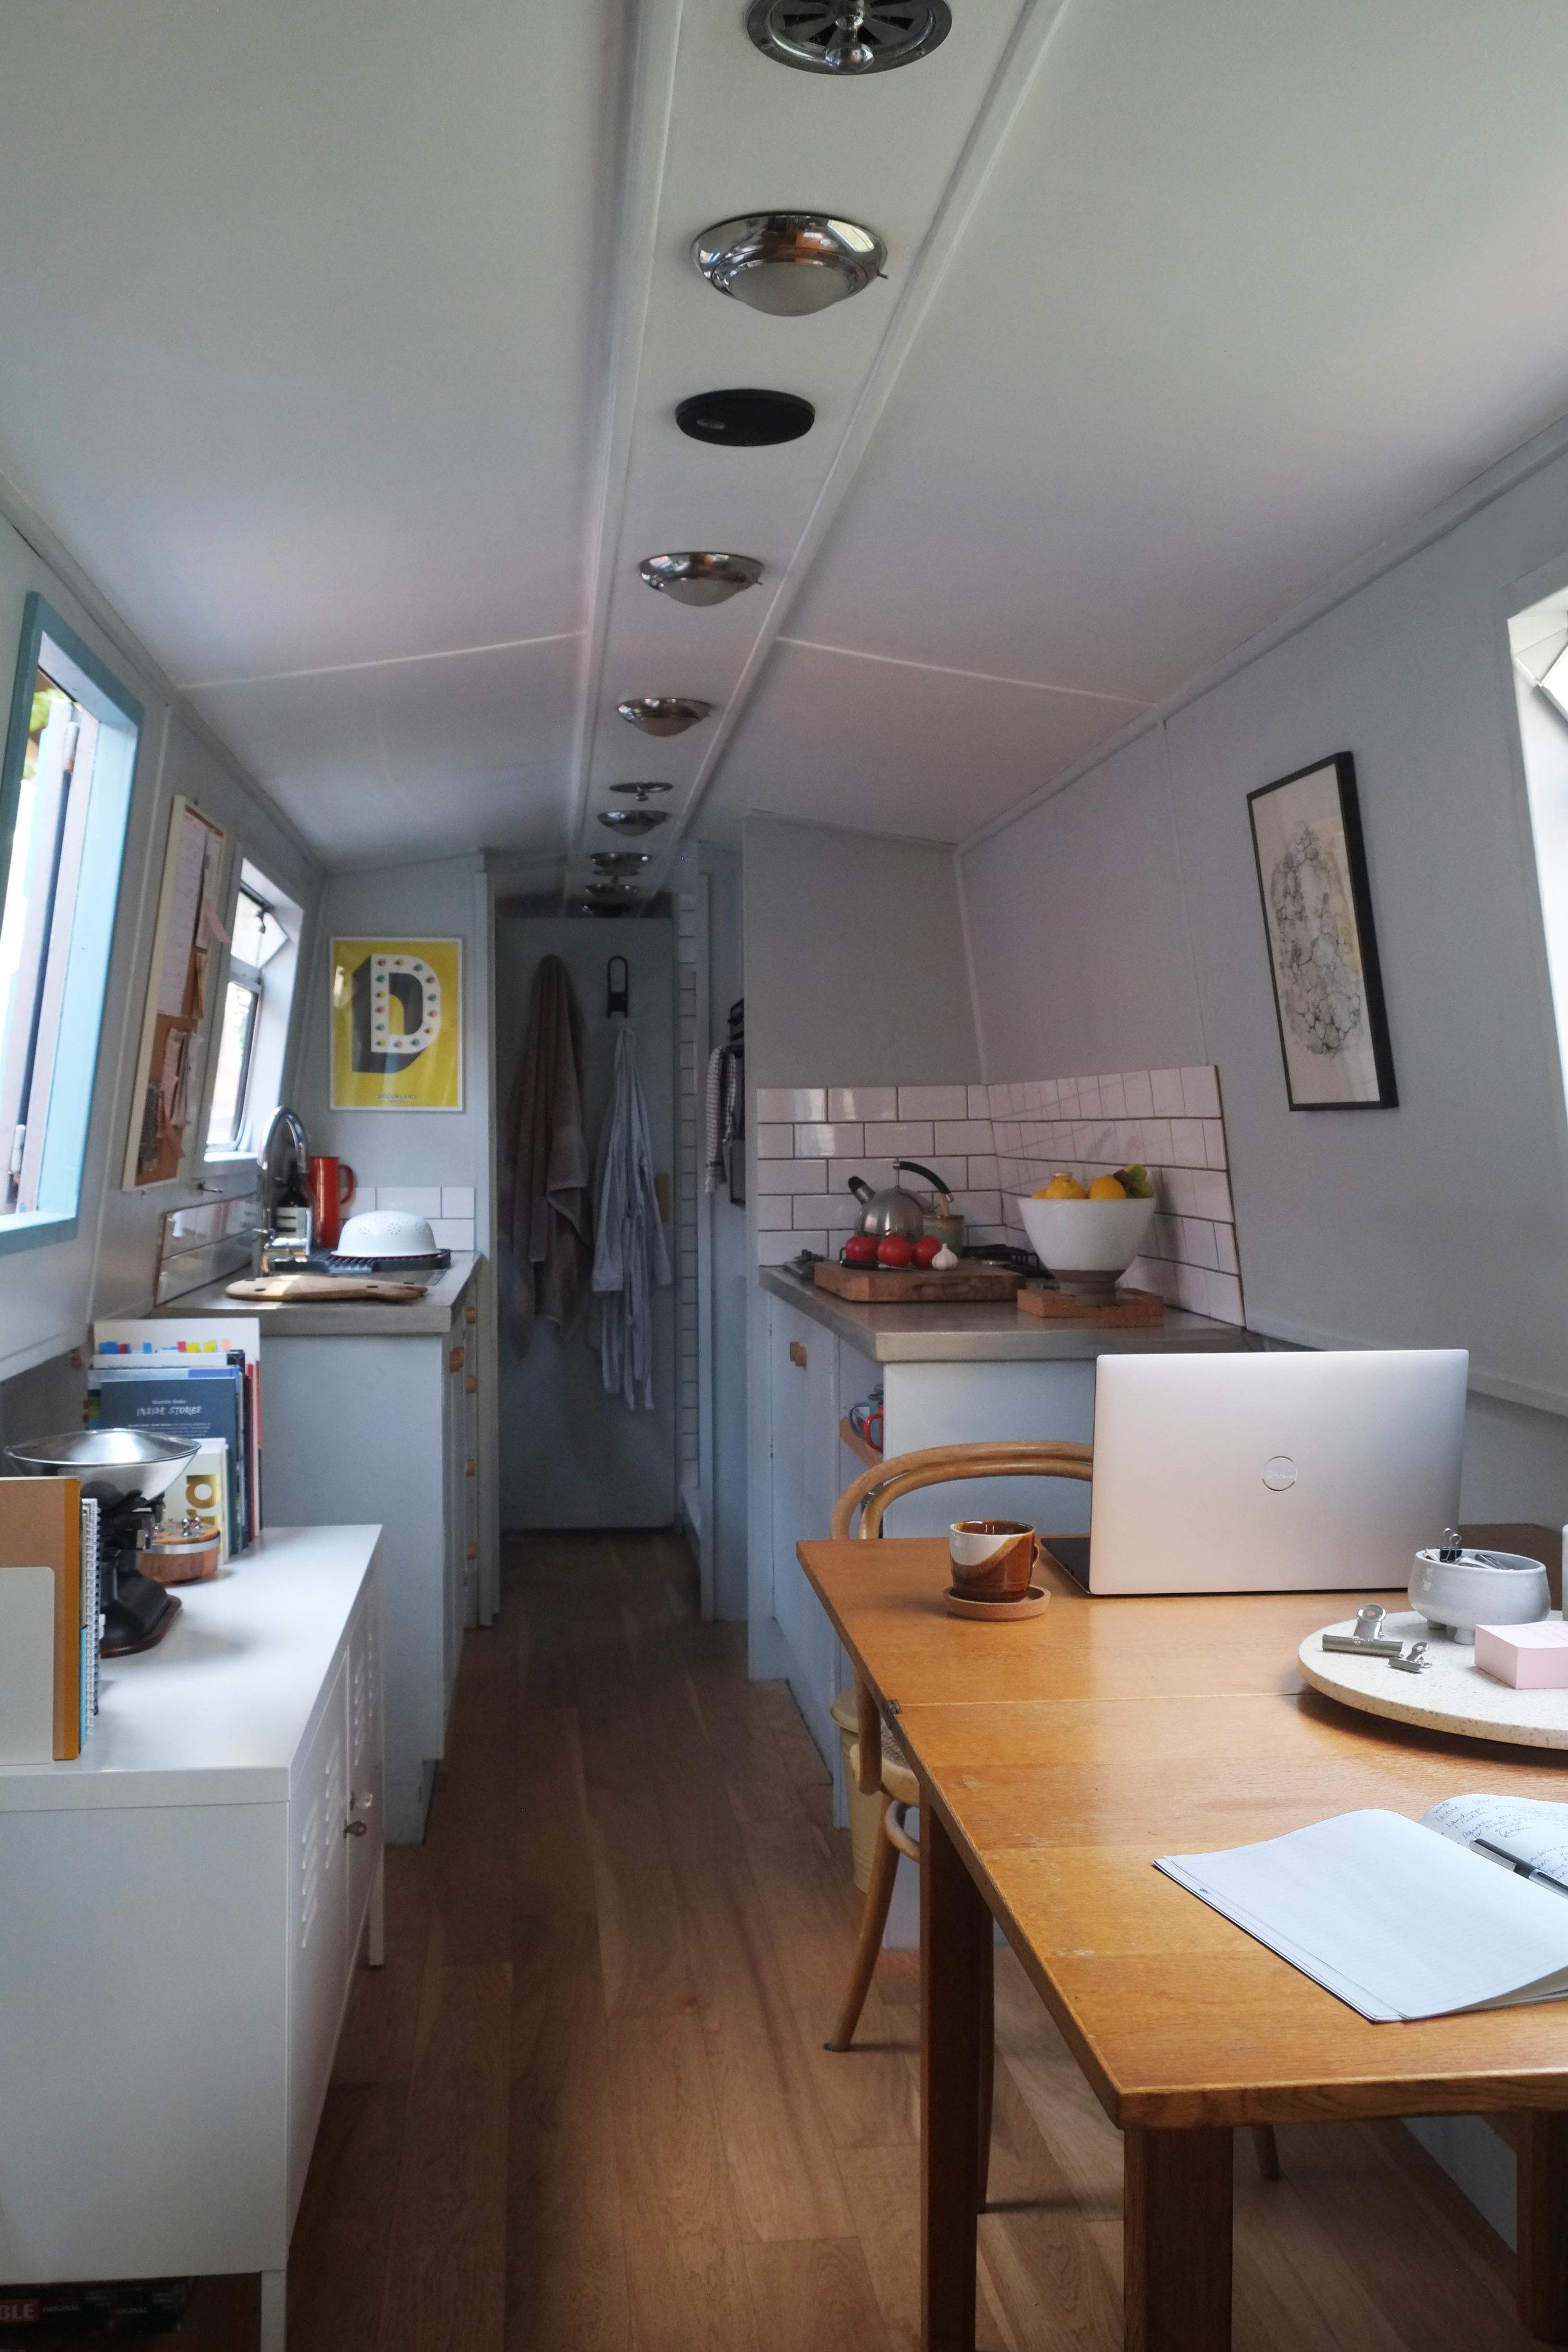 lunarlunar_interior_design_canal_boat_small_space_kitchen_office.jpg